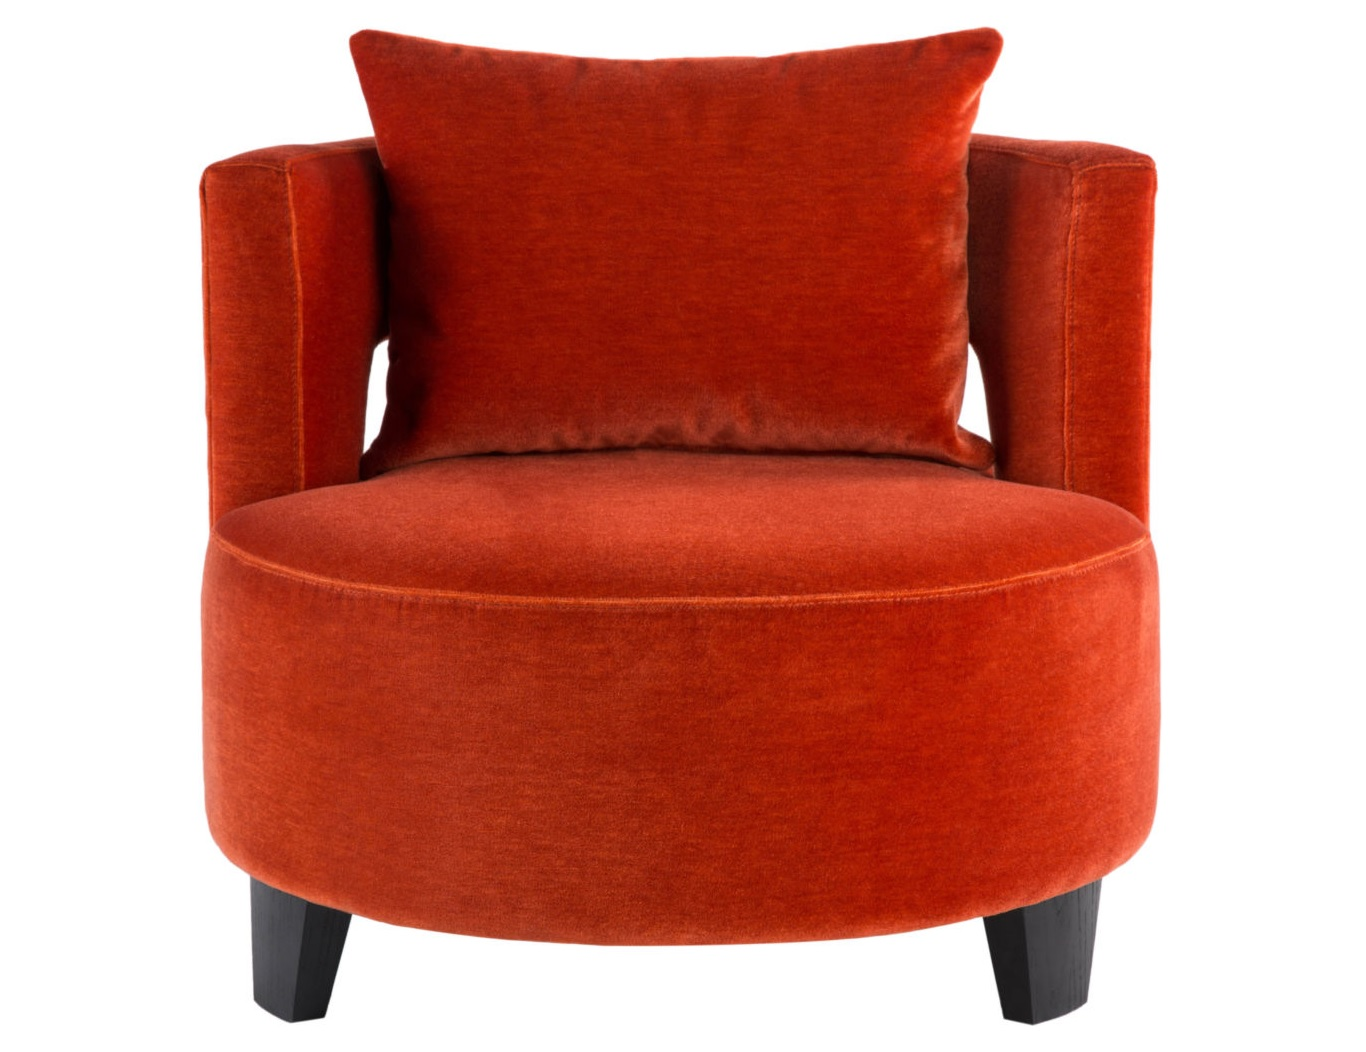 Кресло M-Style 5249642 от thefurnish